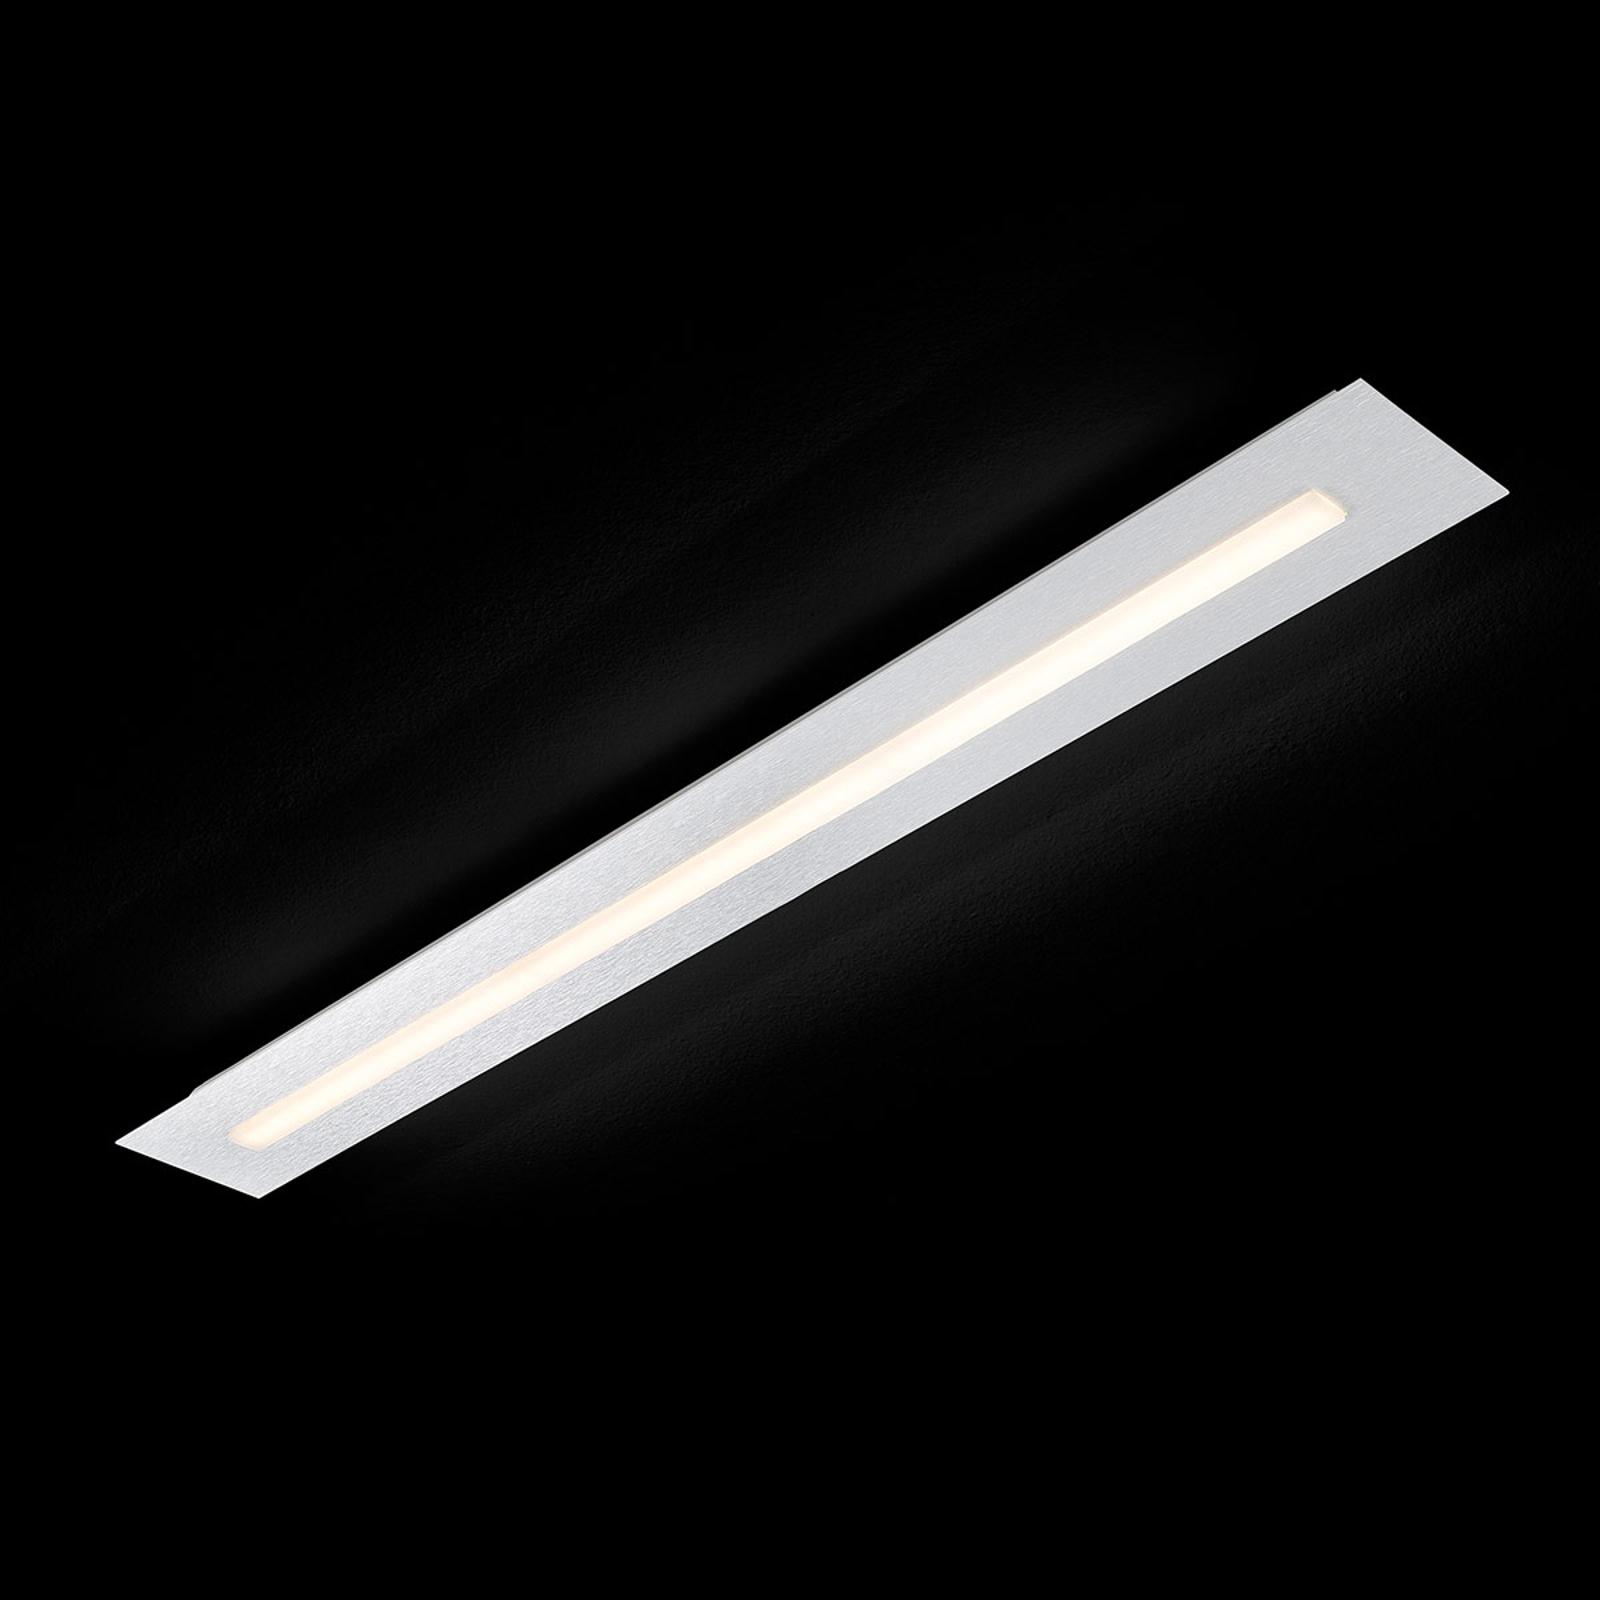 GROSSMANN Fis LED-Deckenleuchte, 80,5 cm